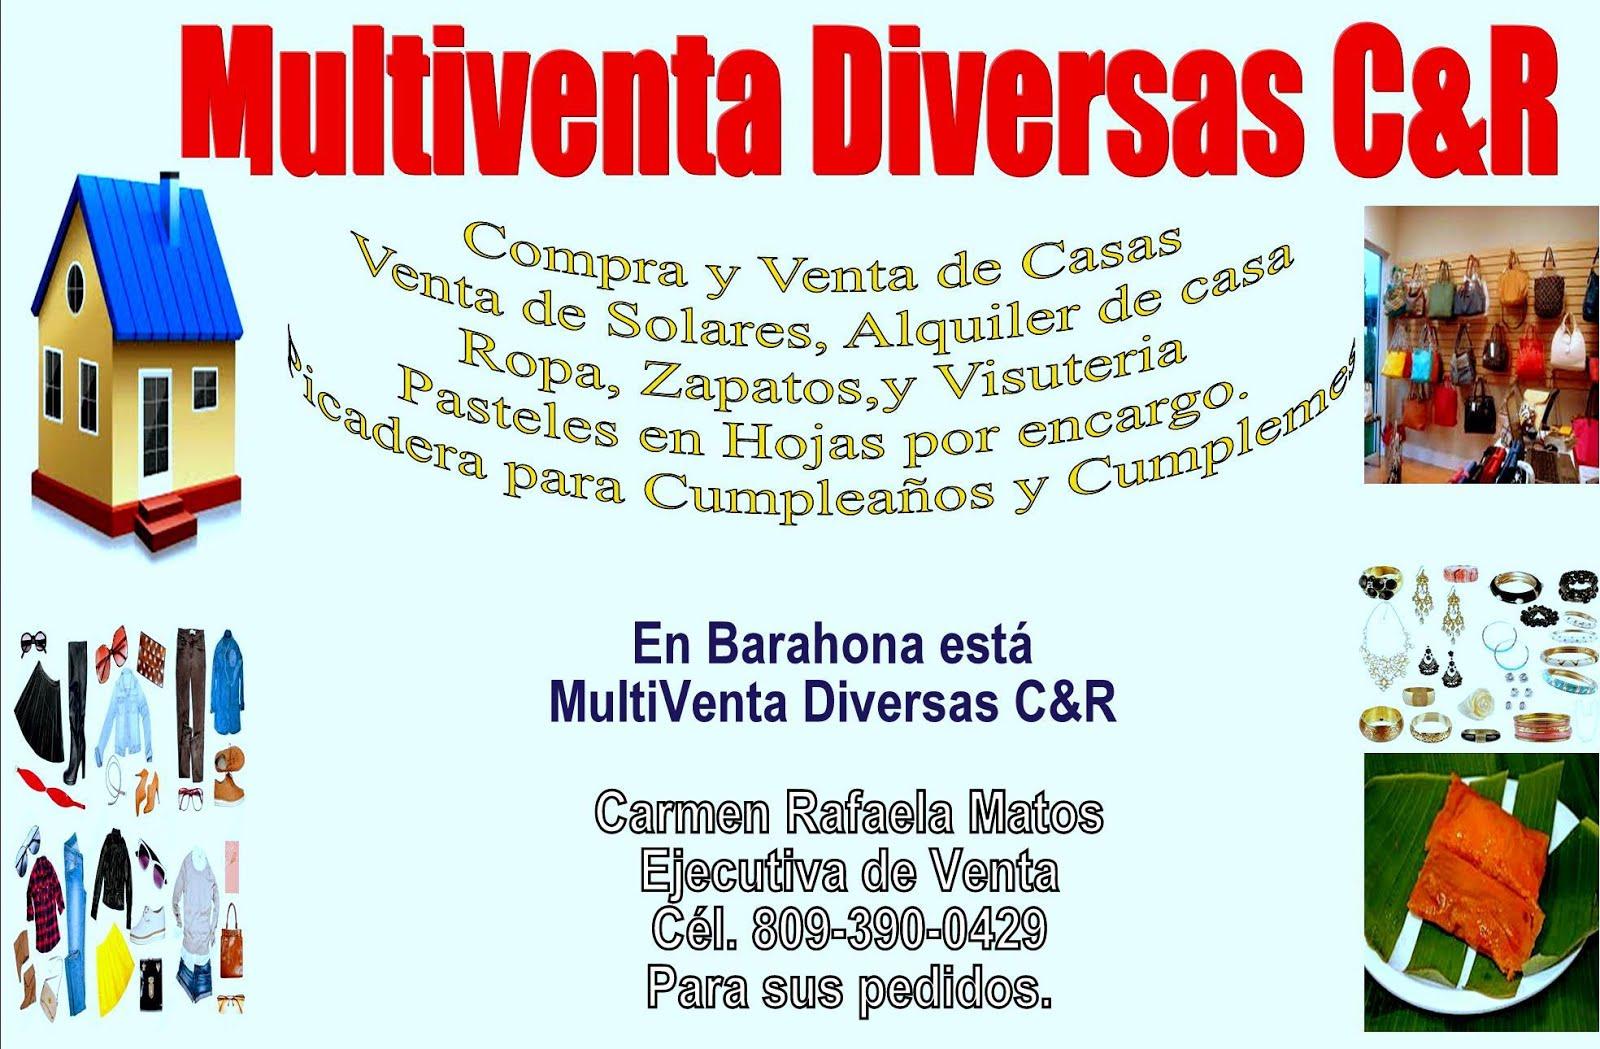 Multiventas Diversas C&R